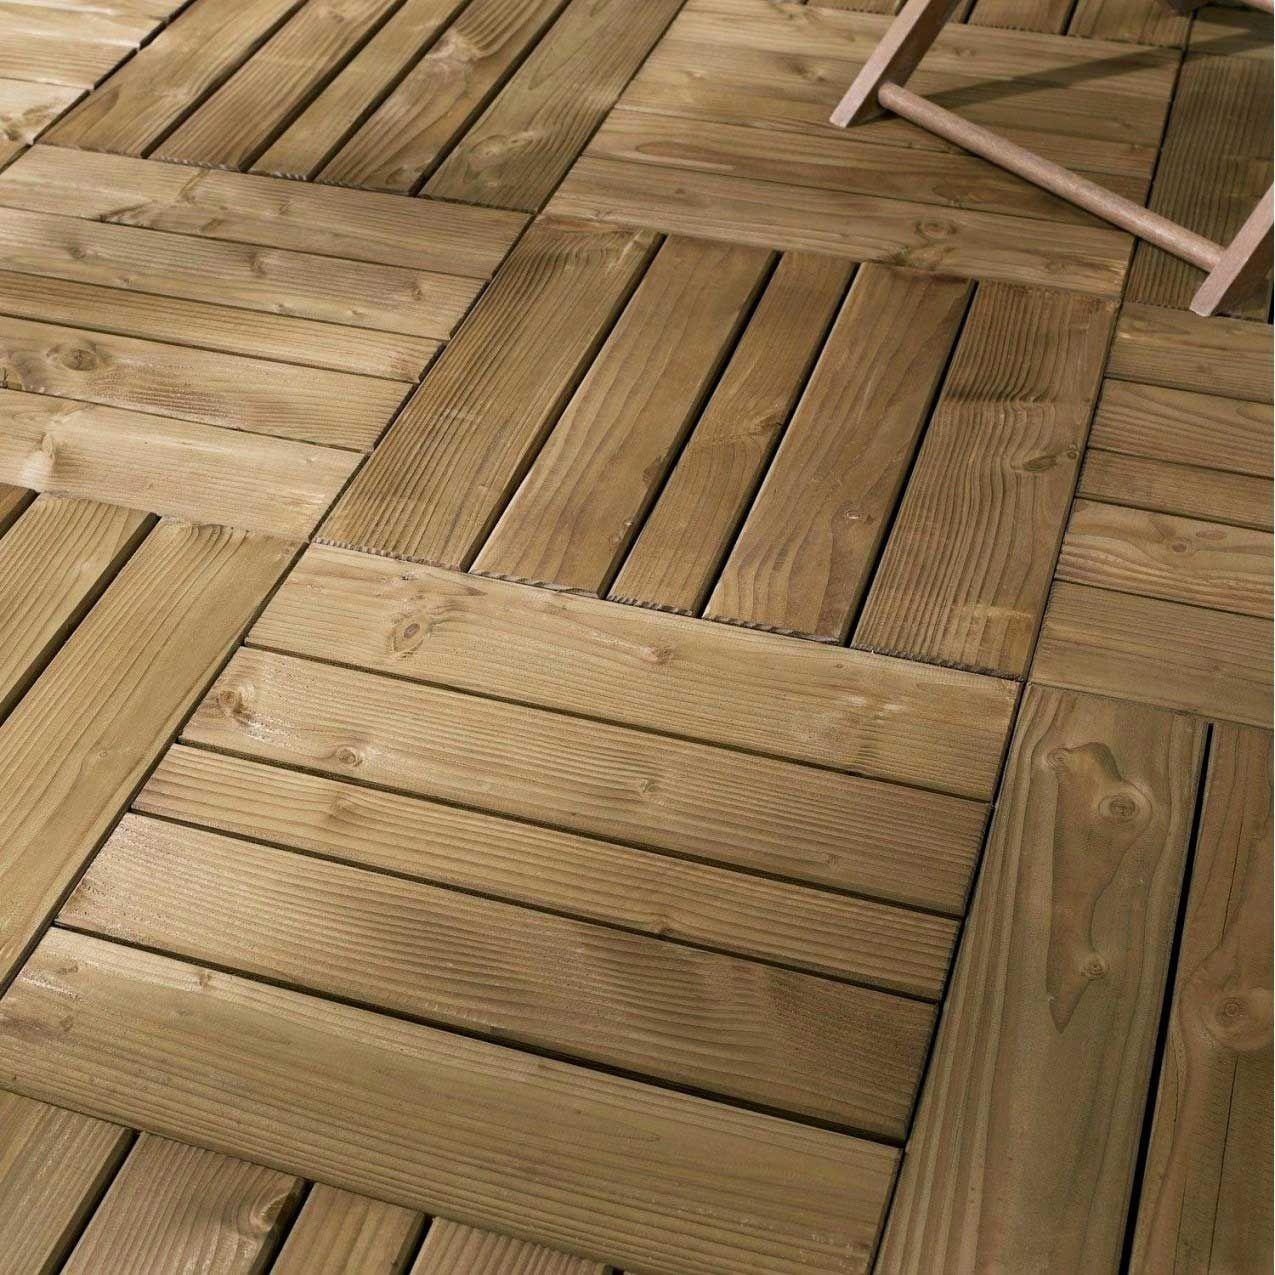 bois terrasse brico depot beau dalle bois terrasse brico